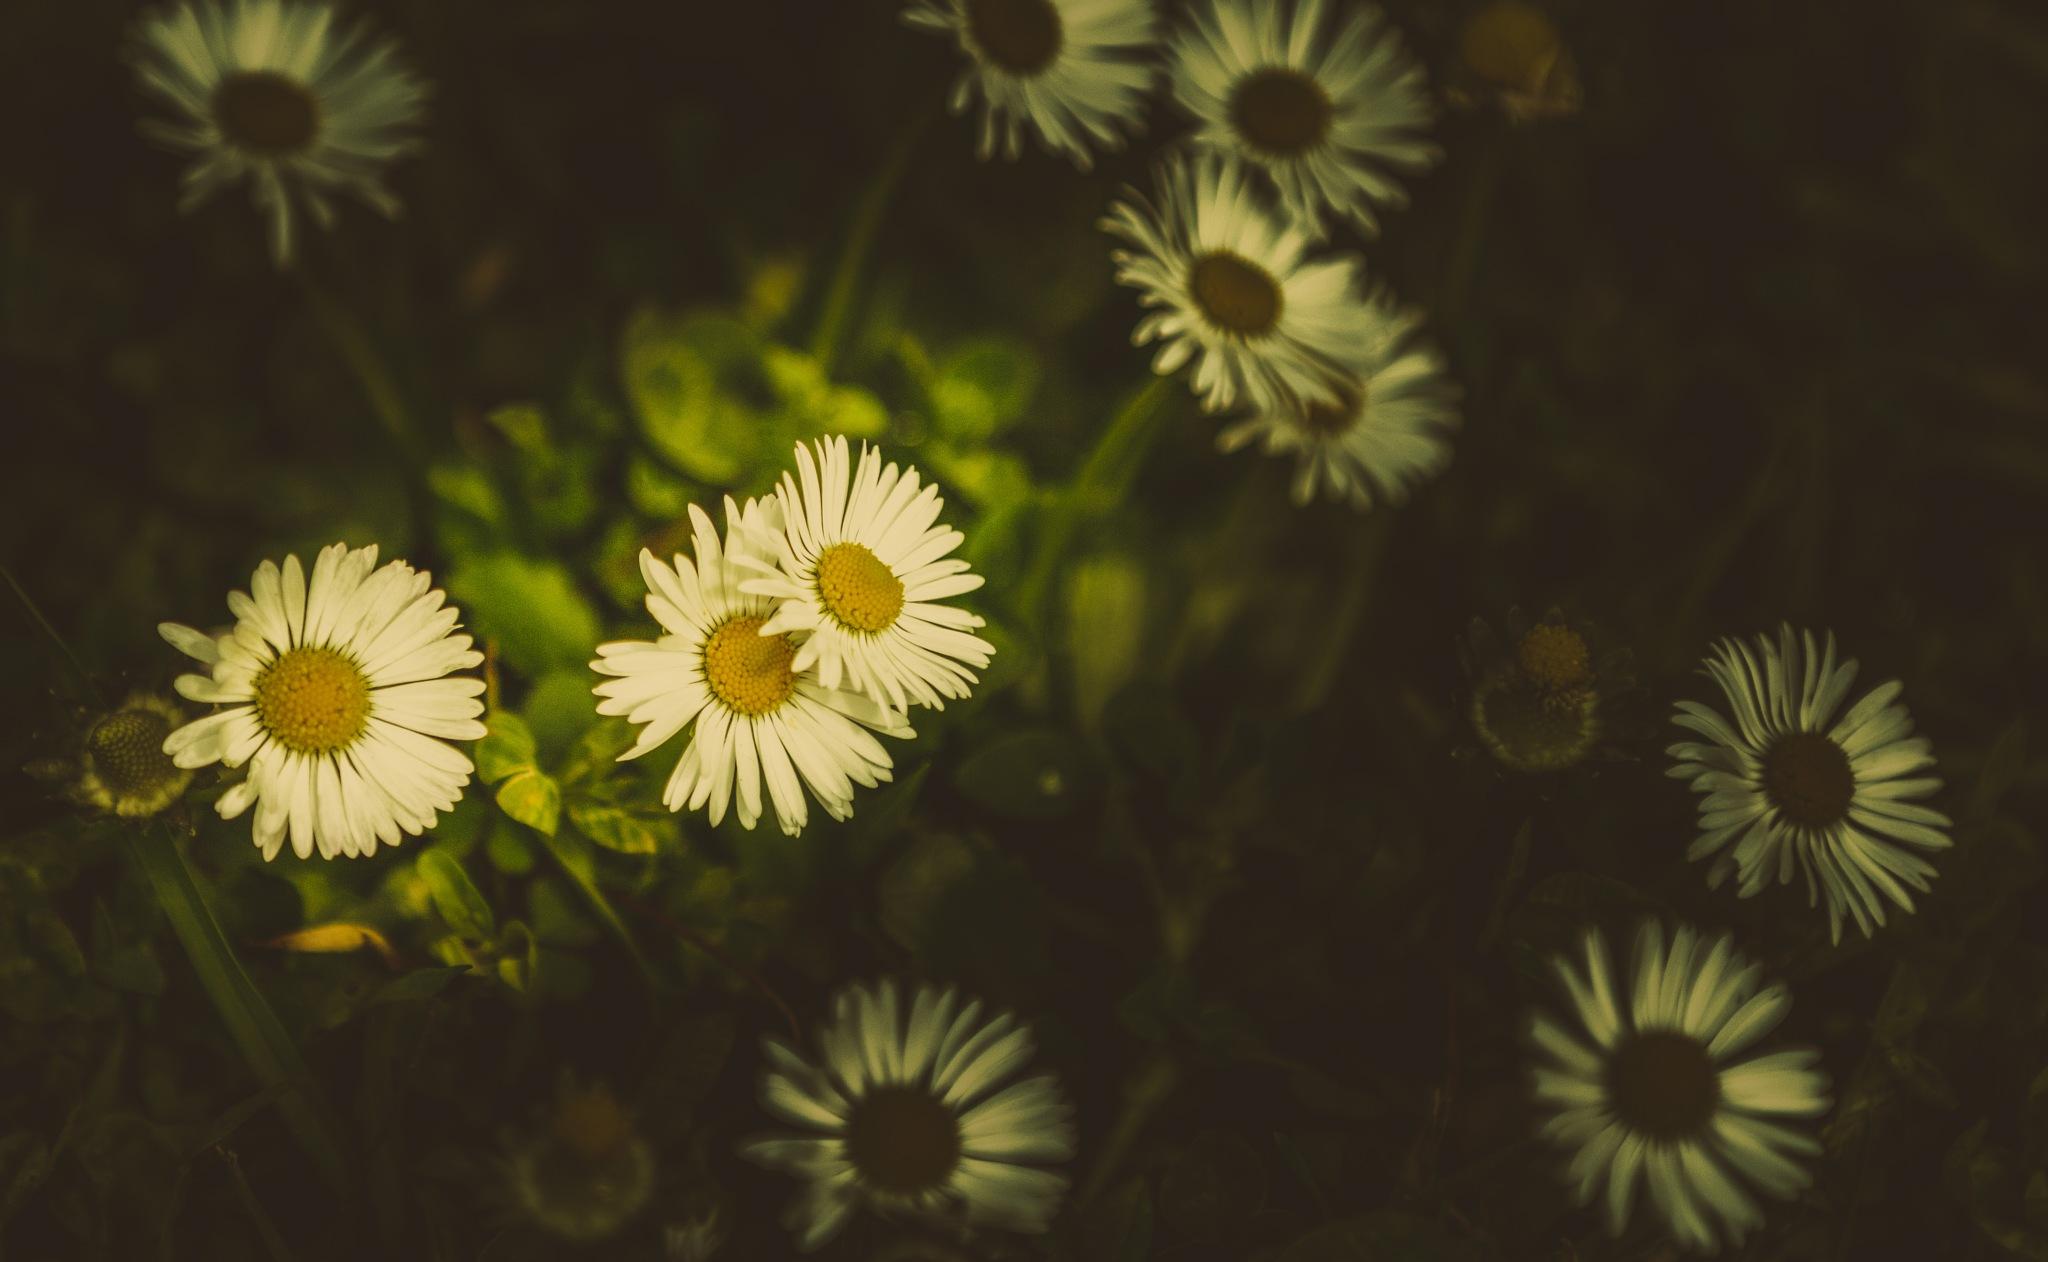 Flowers by Vítor Martins